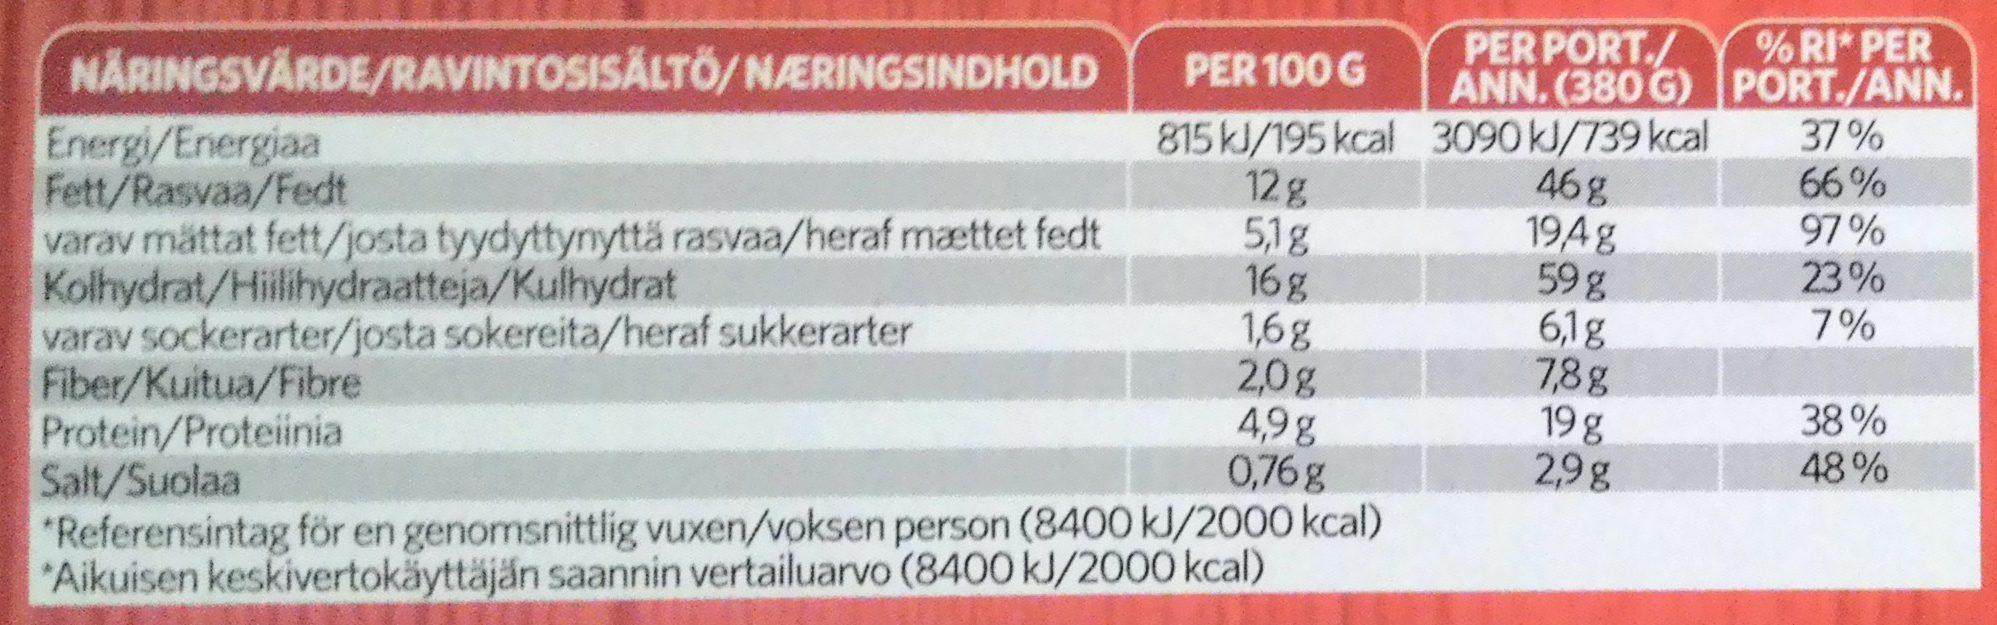 Findus Dagens Grillad Angusbiff med pommes stripes - Nutrition facts